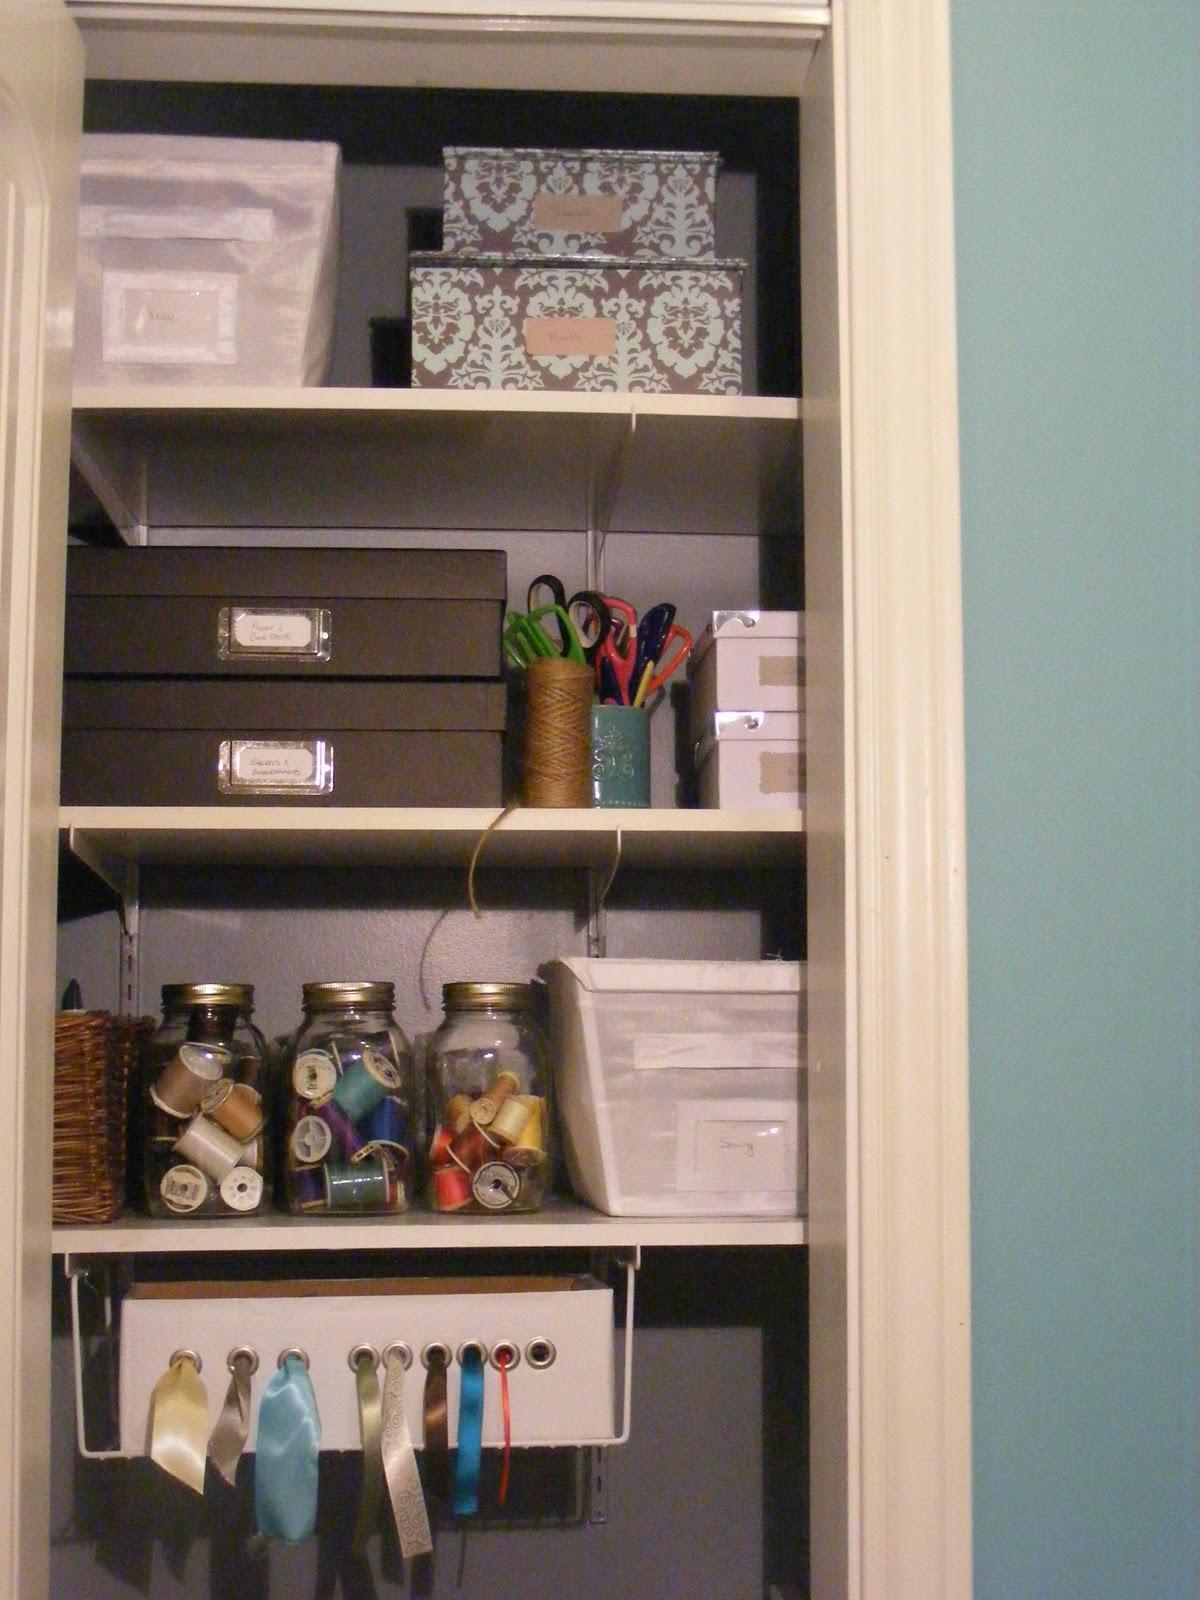 Craft closet organization ideas -  Organizedhome Day 30 My Craft Closet